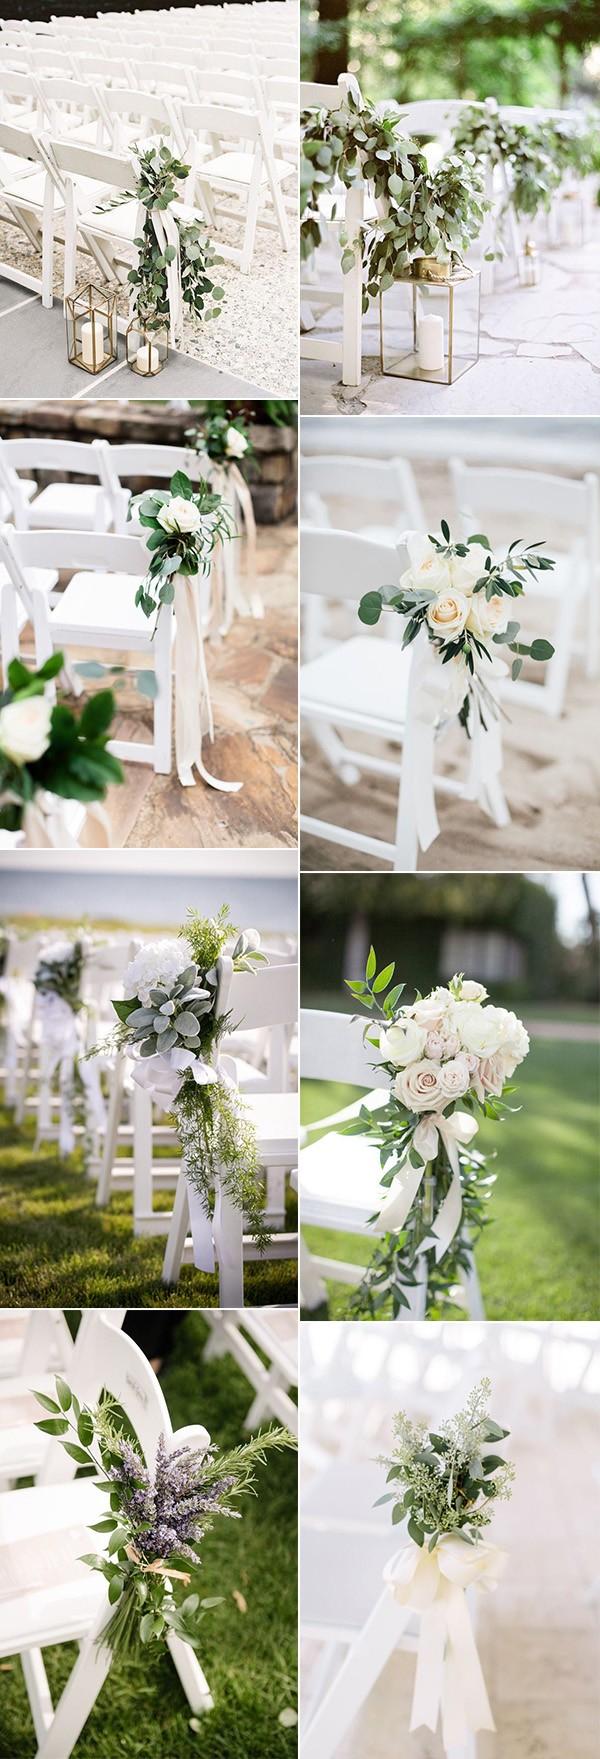 Wedding Alter Decorations 32 Inspirational Outdoor Wedding Aisle Decoration Ideas Oh Best